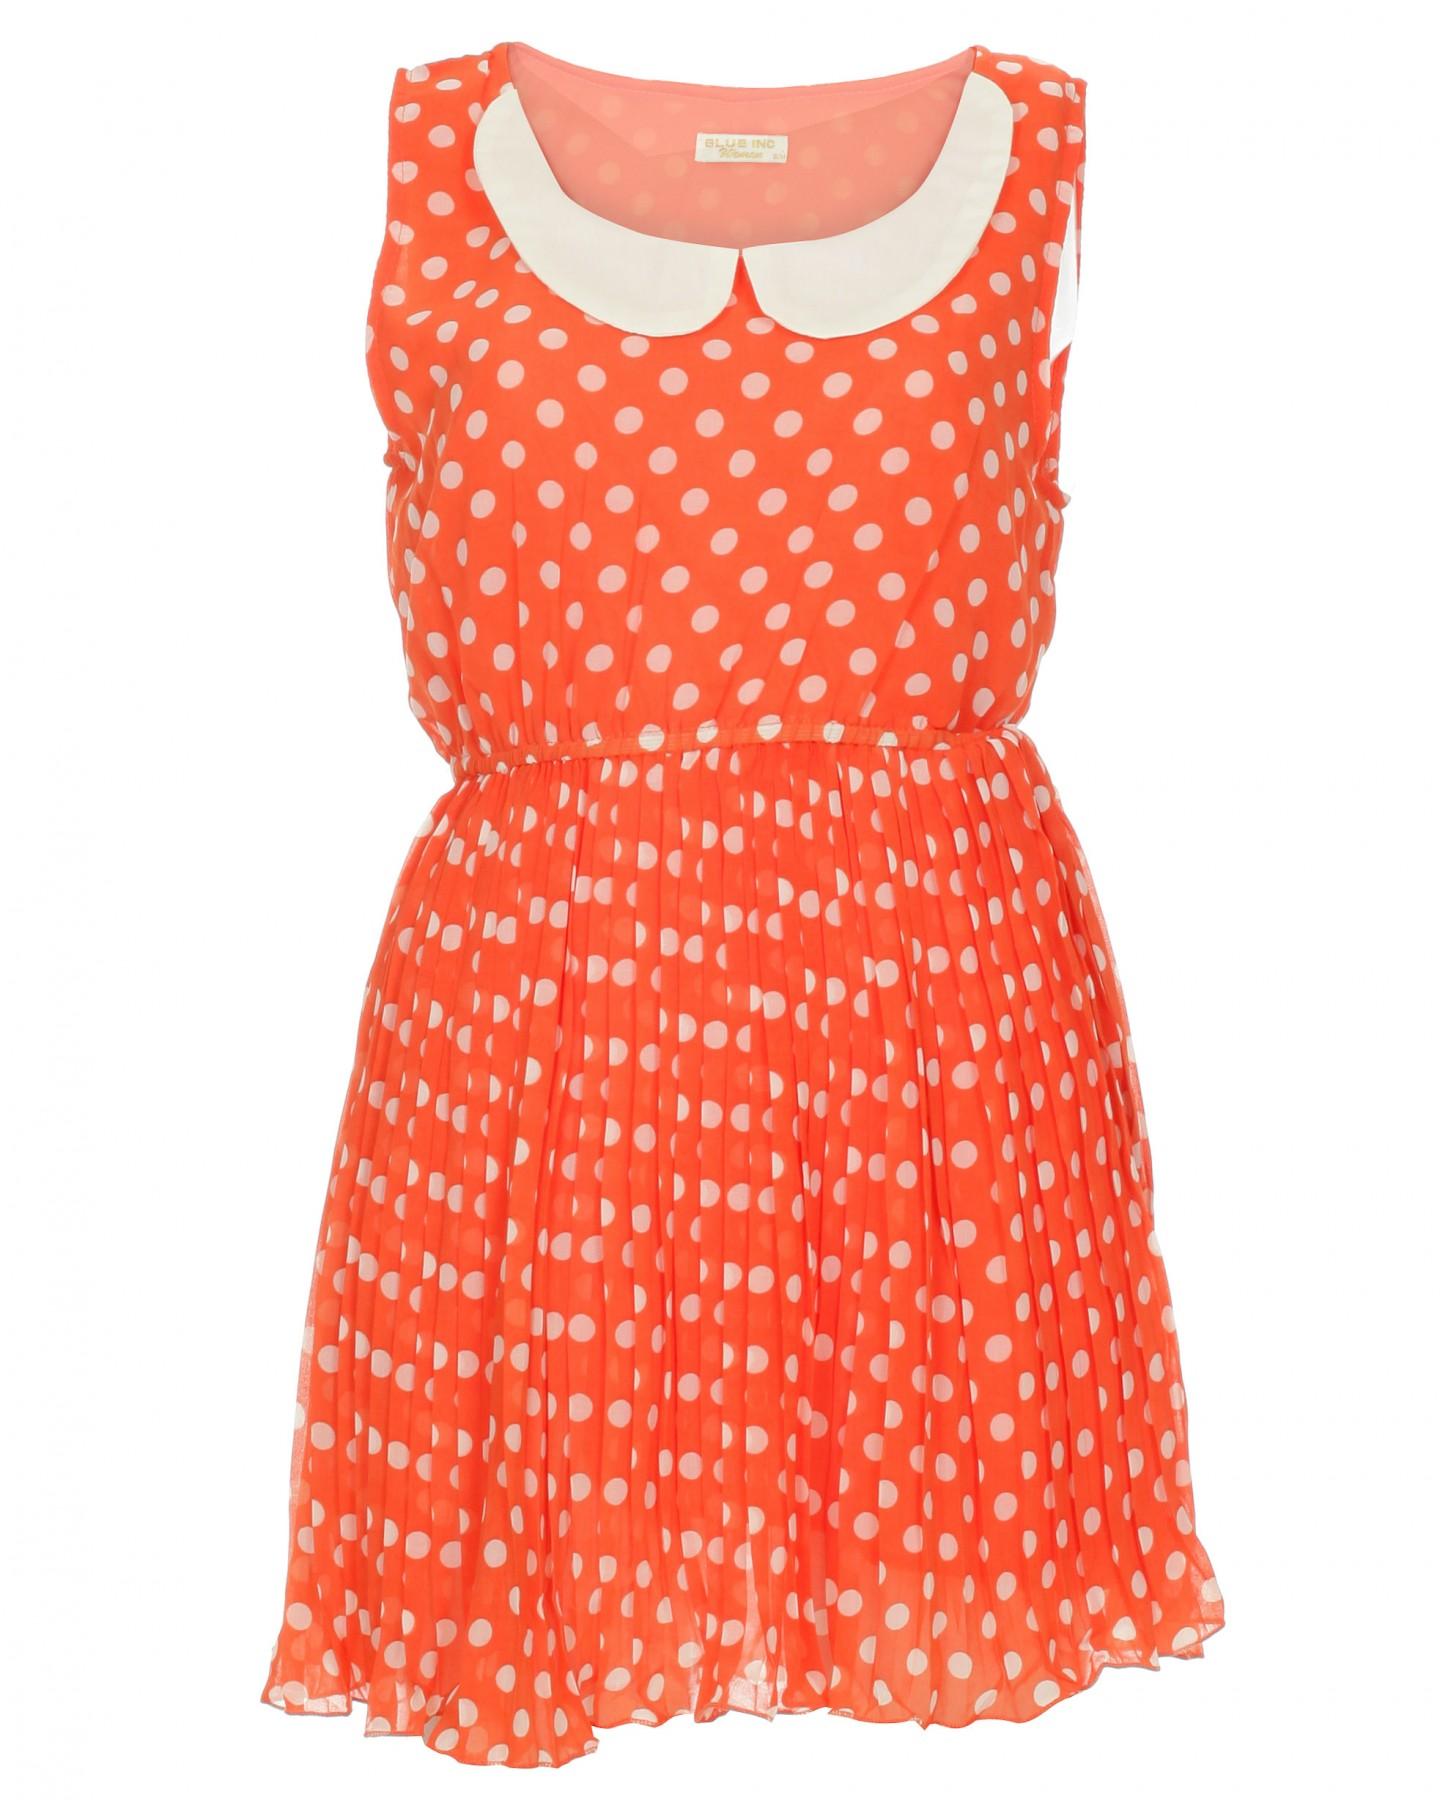 Blue-Inc-Womens-Peter-Pan-Polka-Dot-Dress-Orange